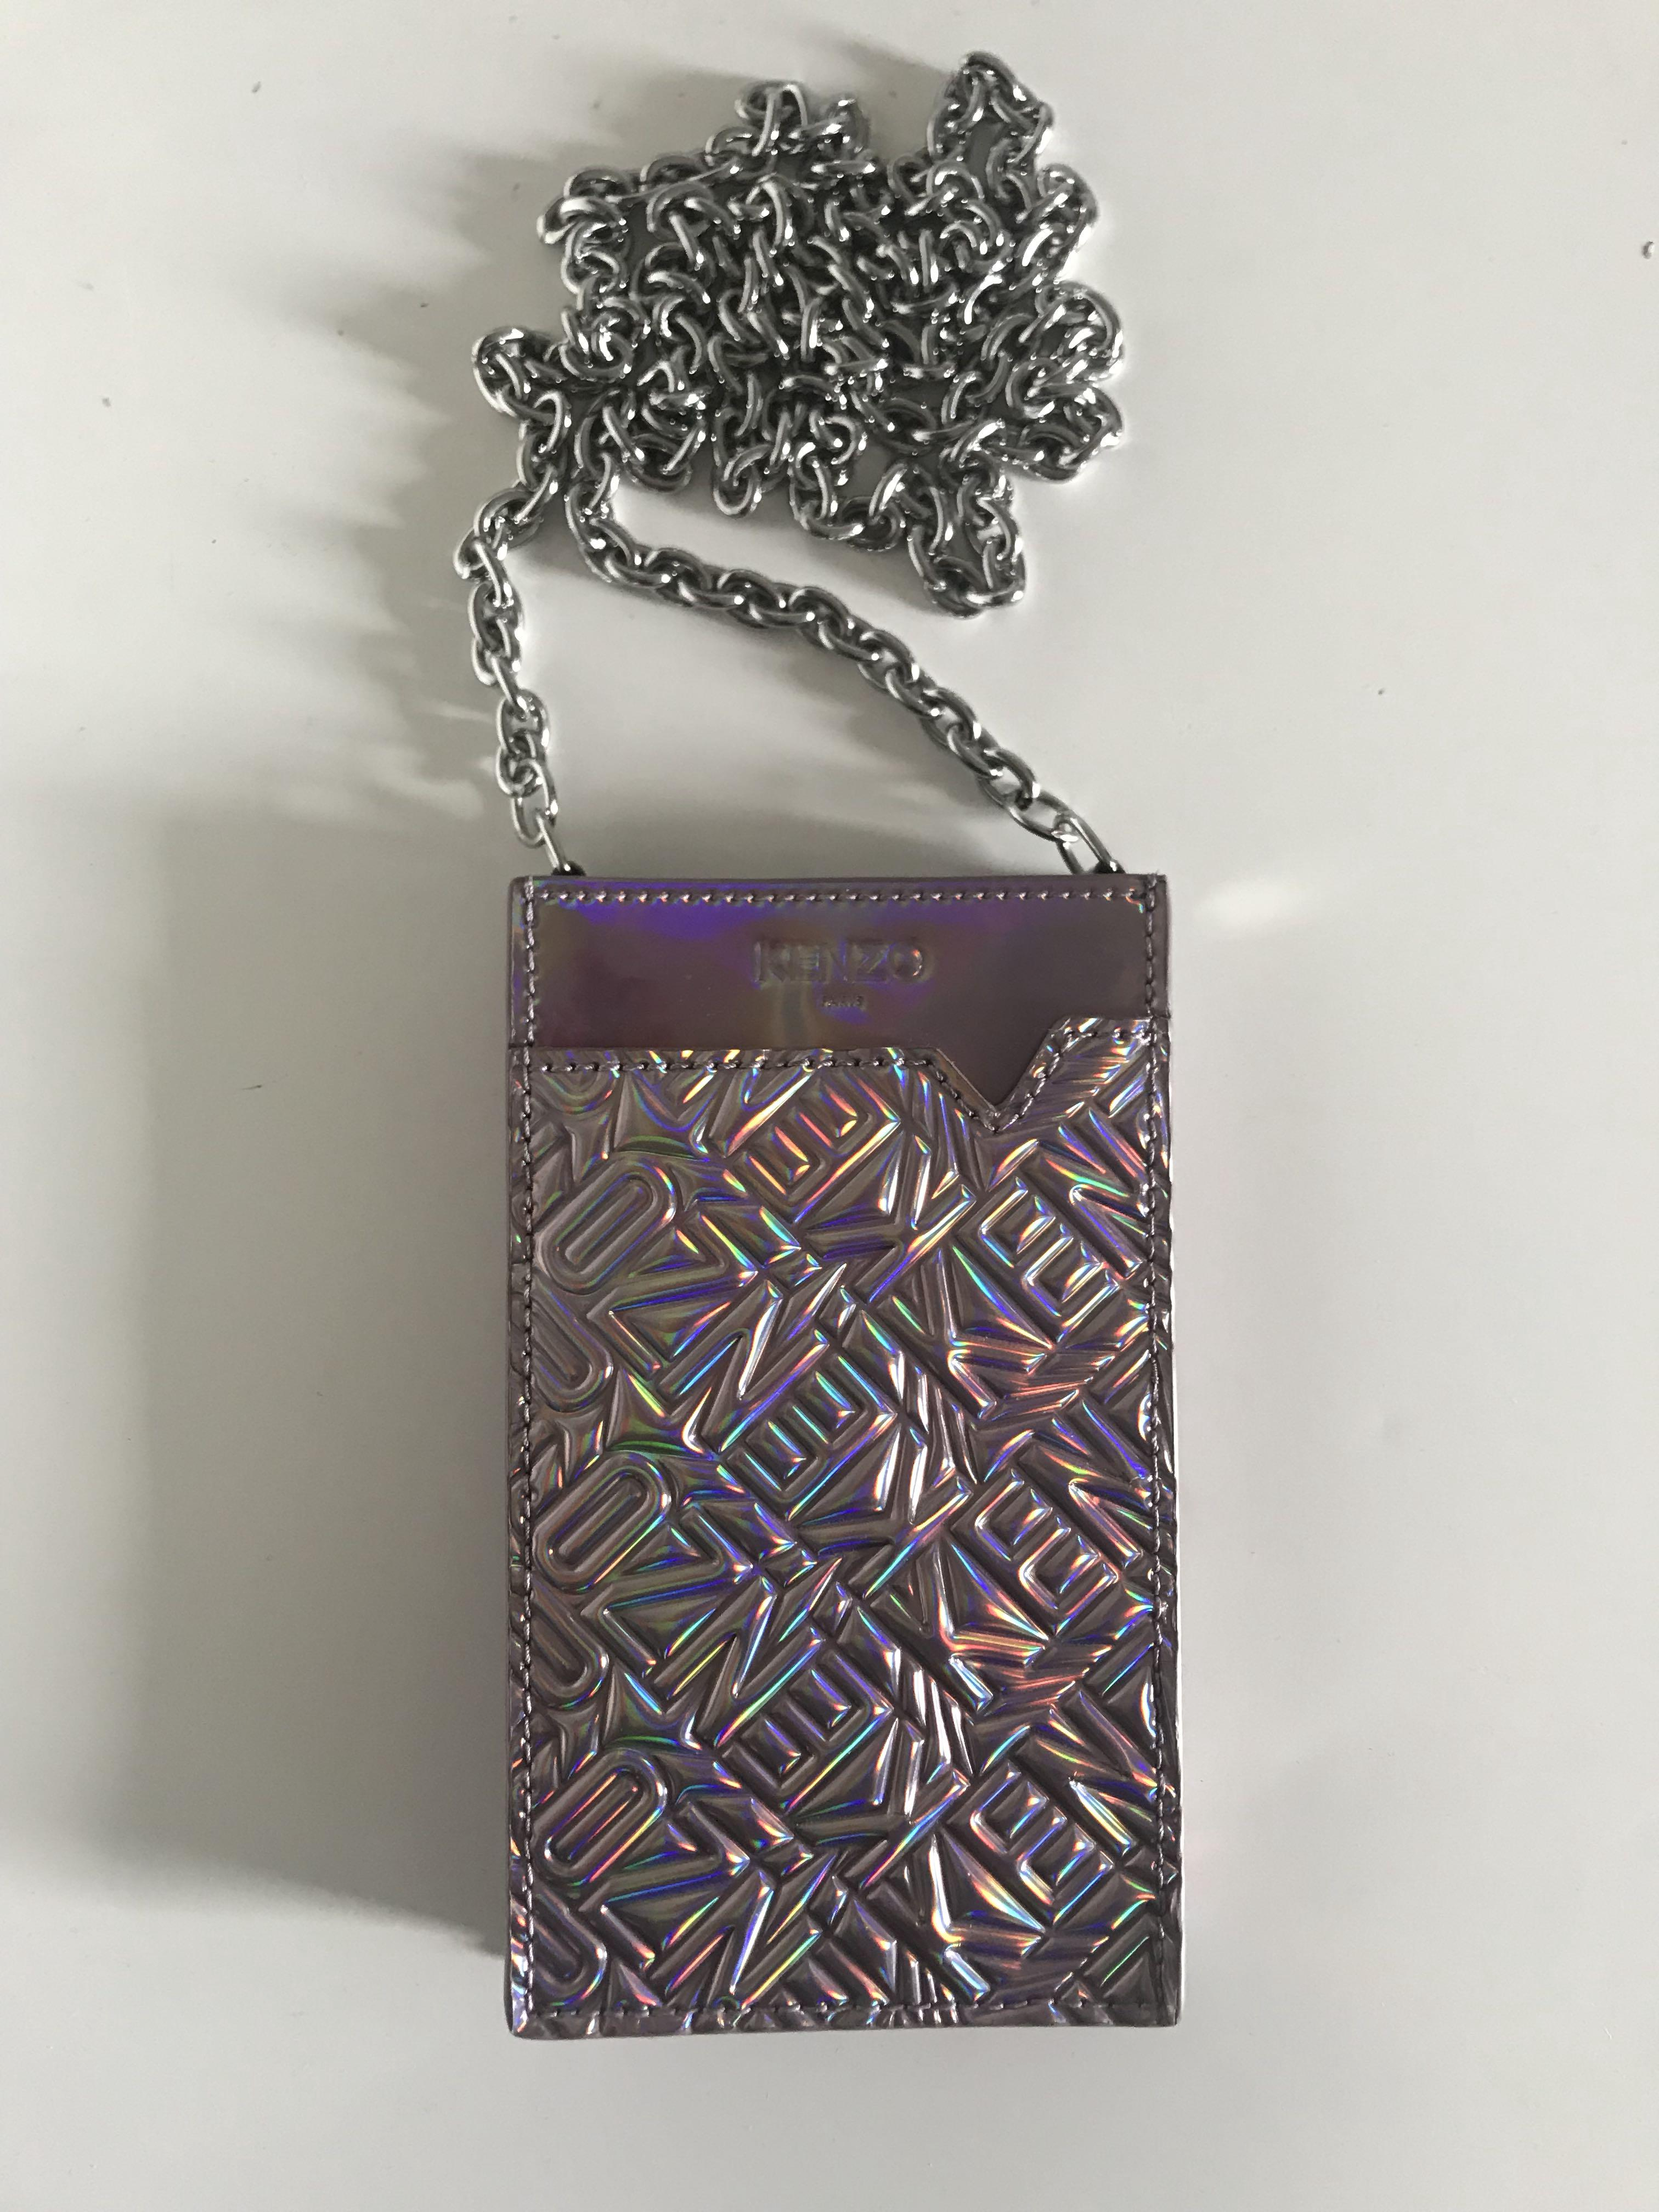 KENZO embossed phone bag